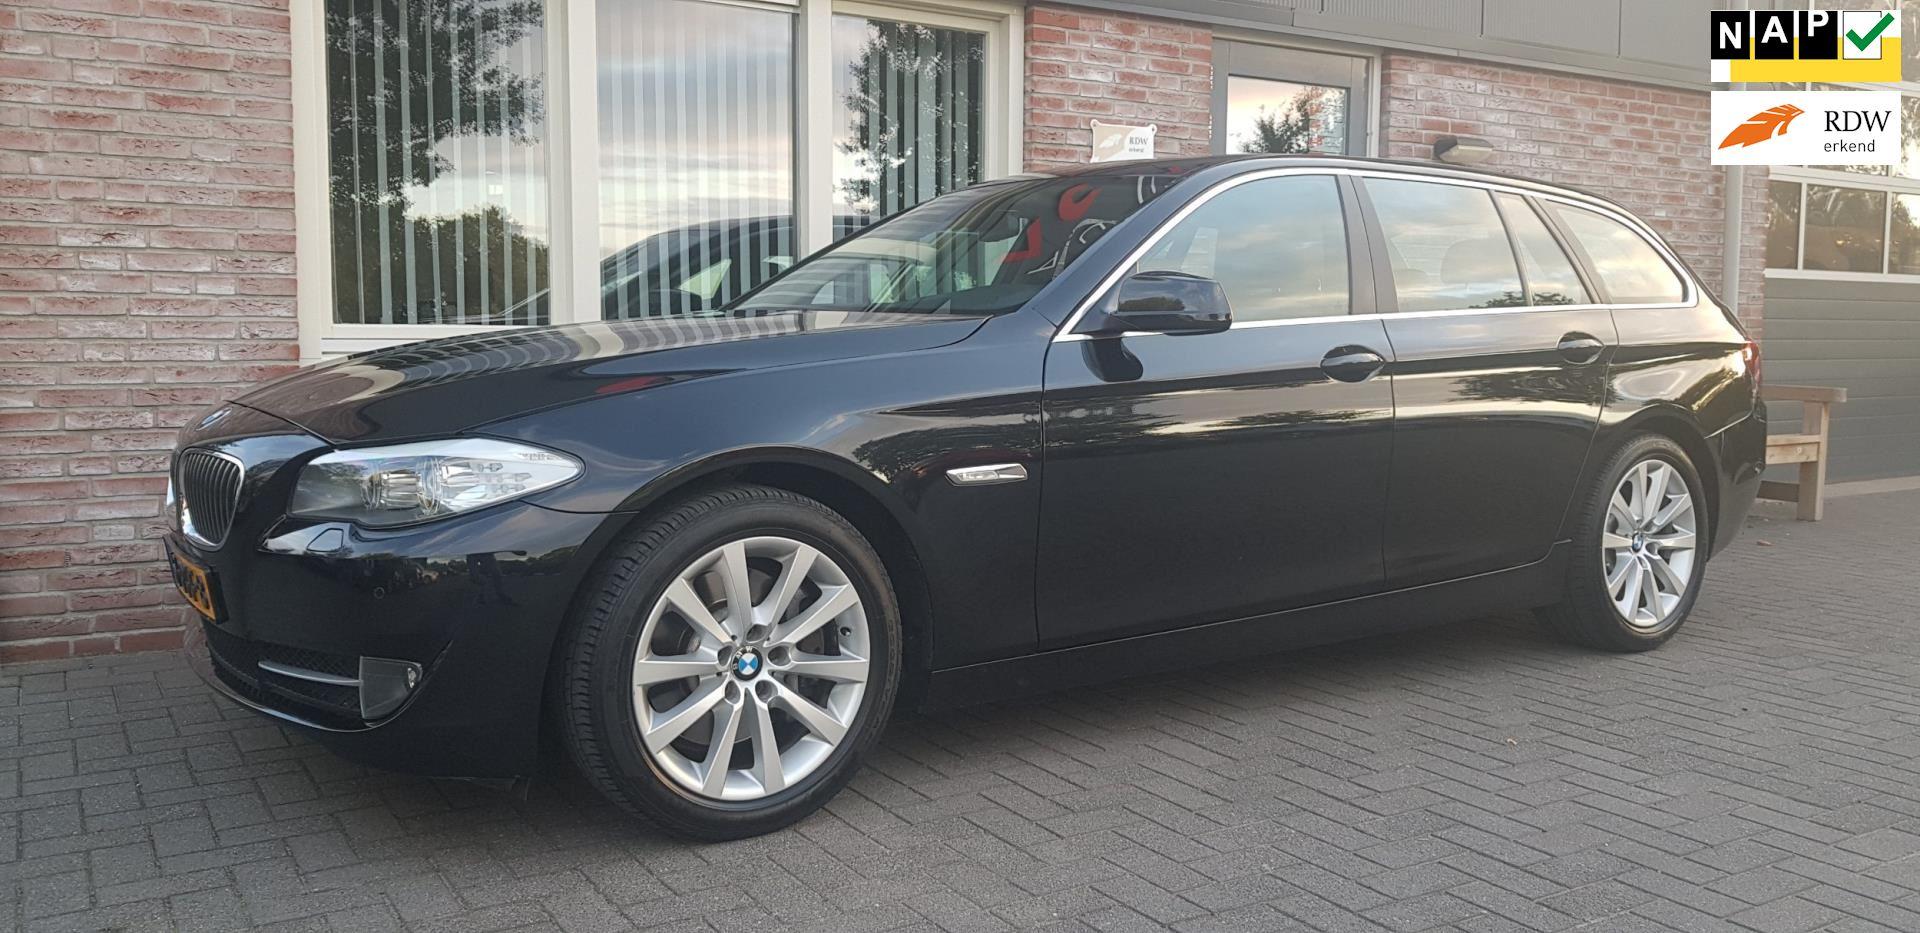 BMW 5-serie Touring occasion - Autobedrijf Achterberg